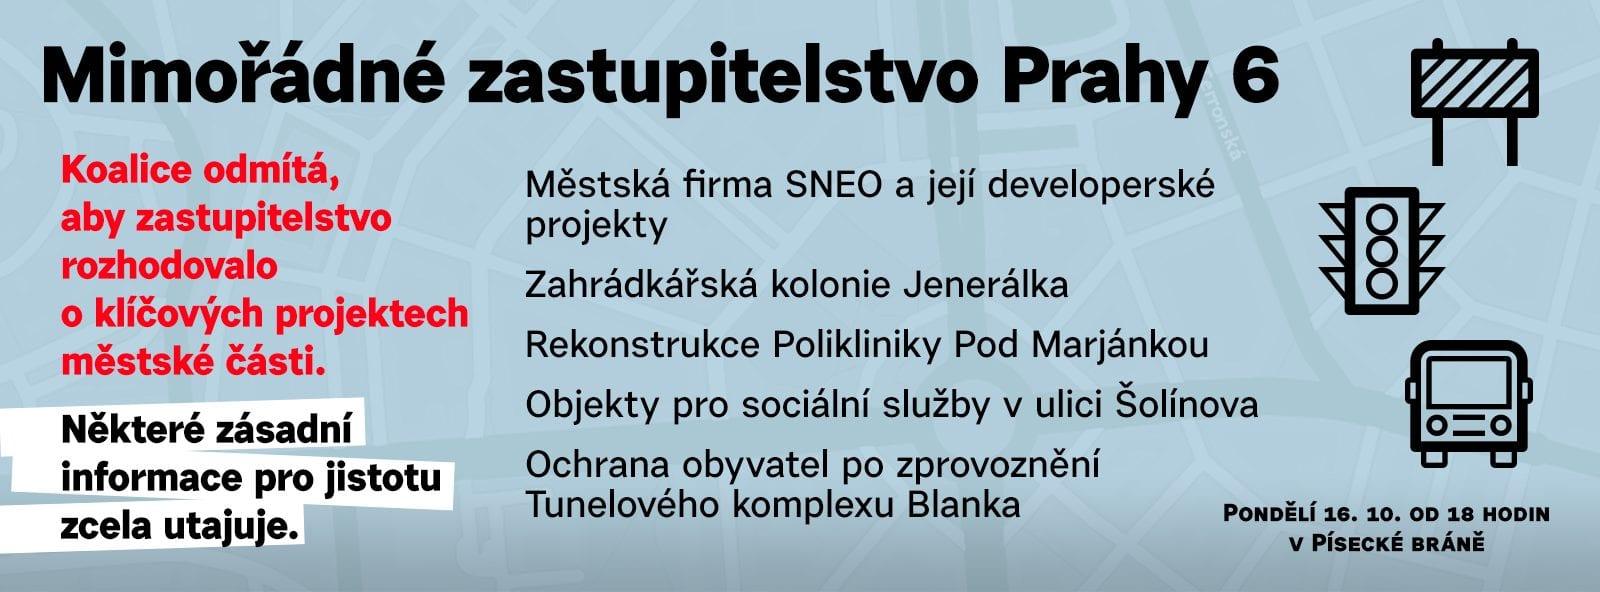 mimoradne-zastupko-2017-03